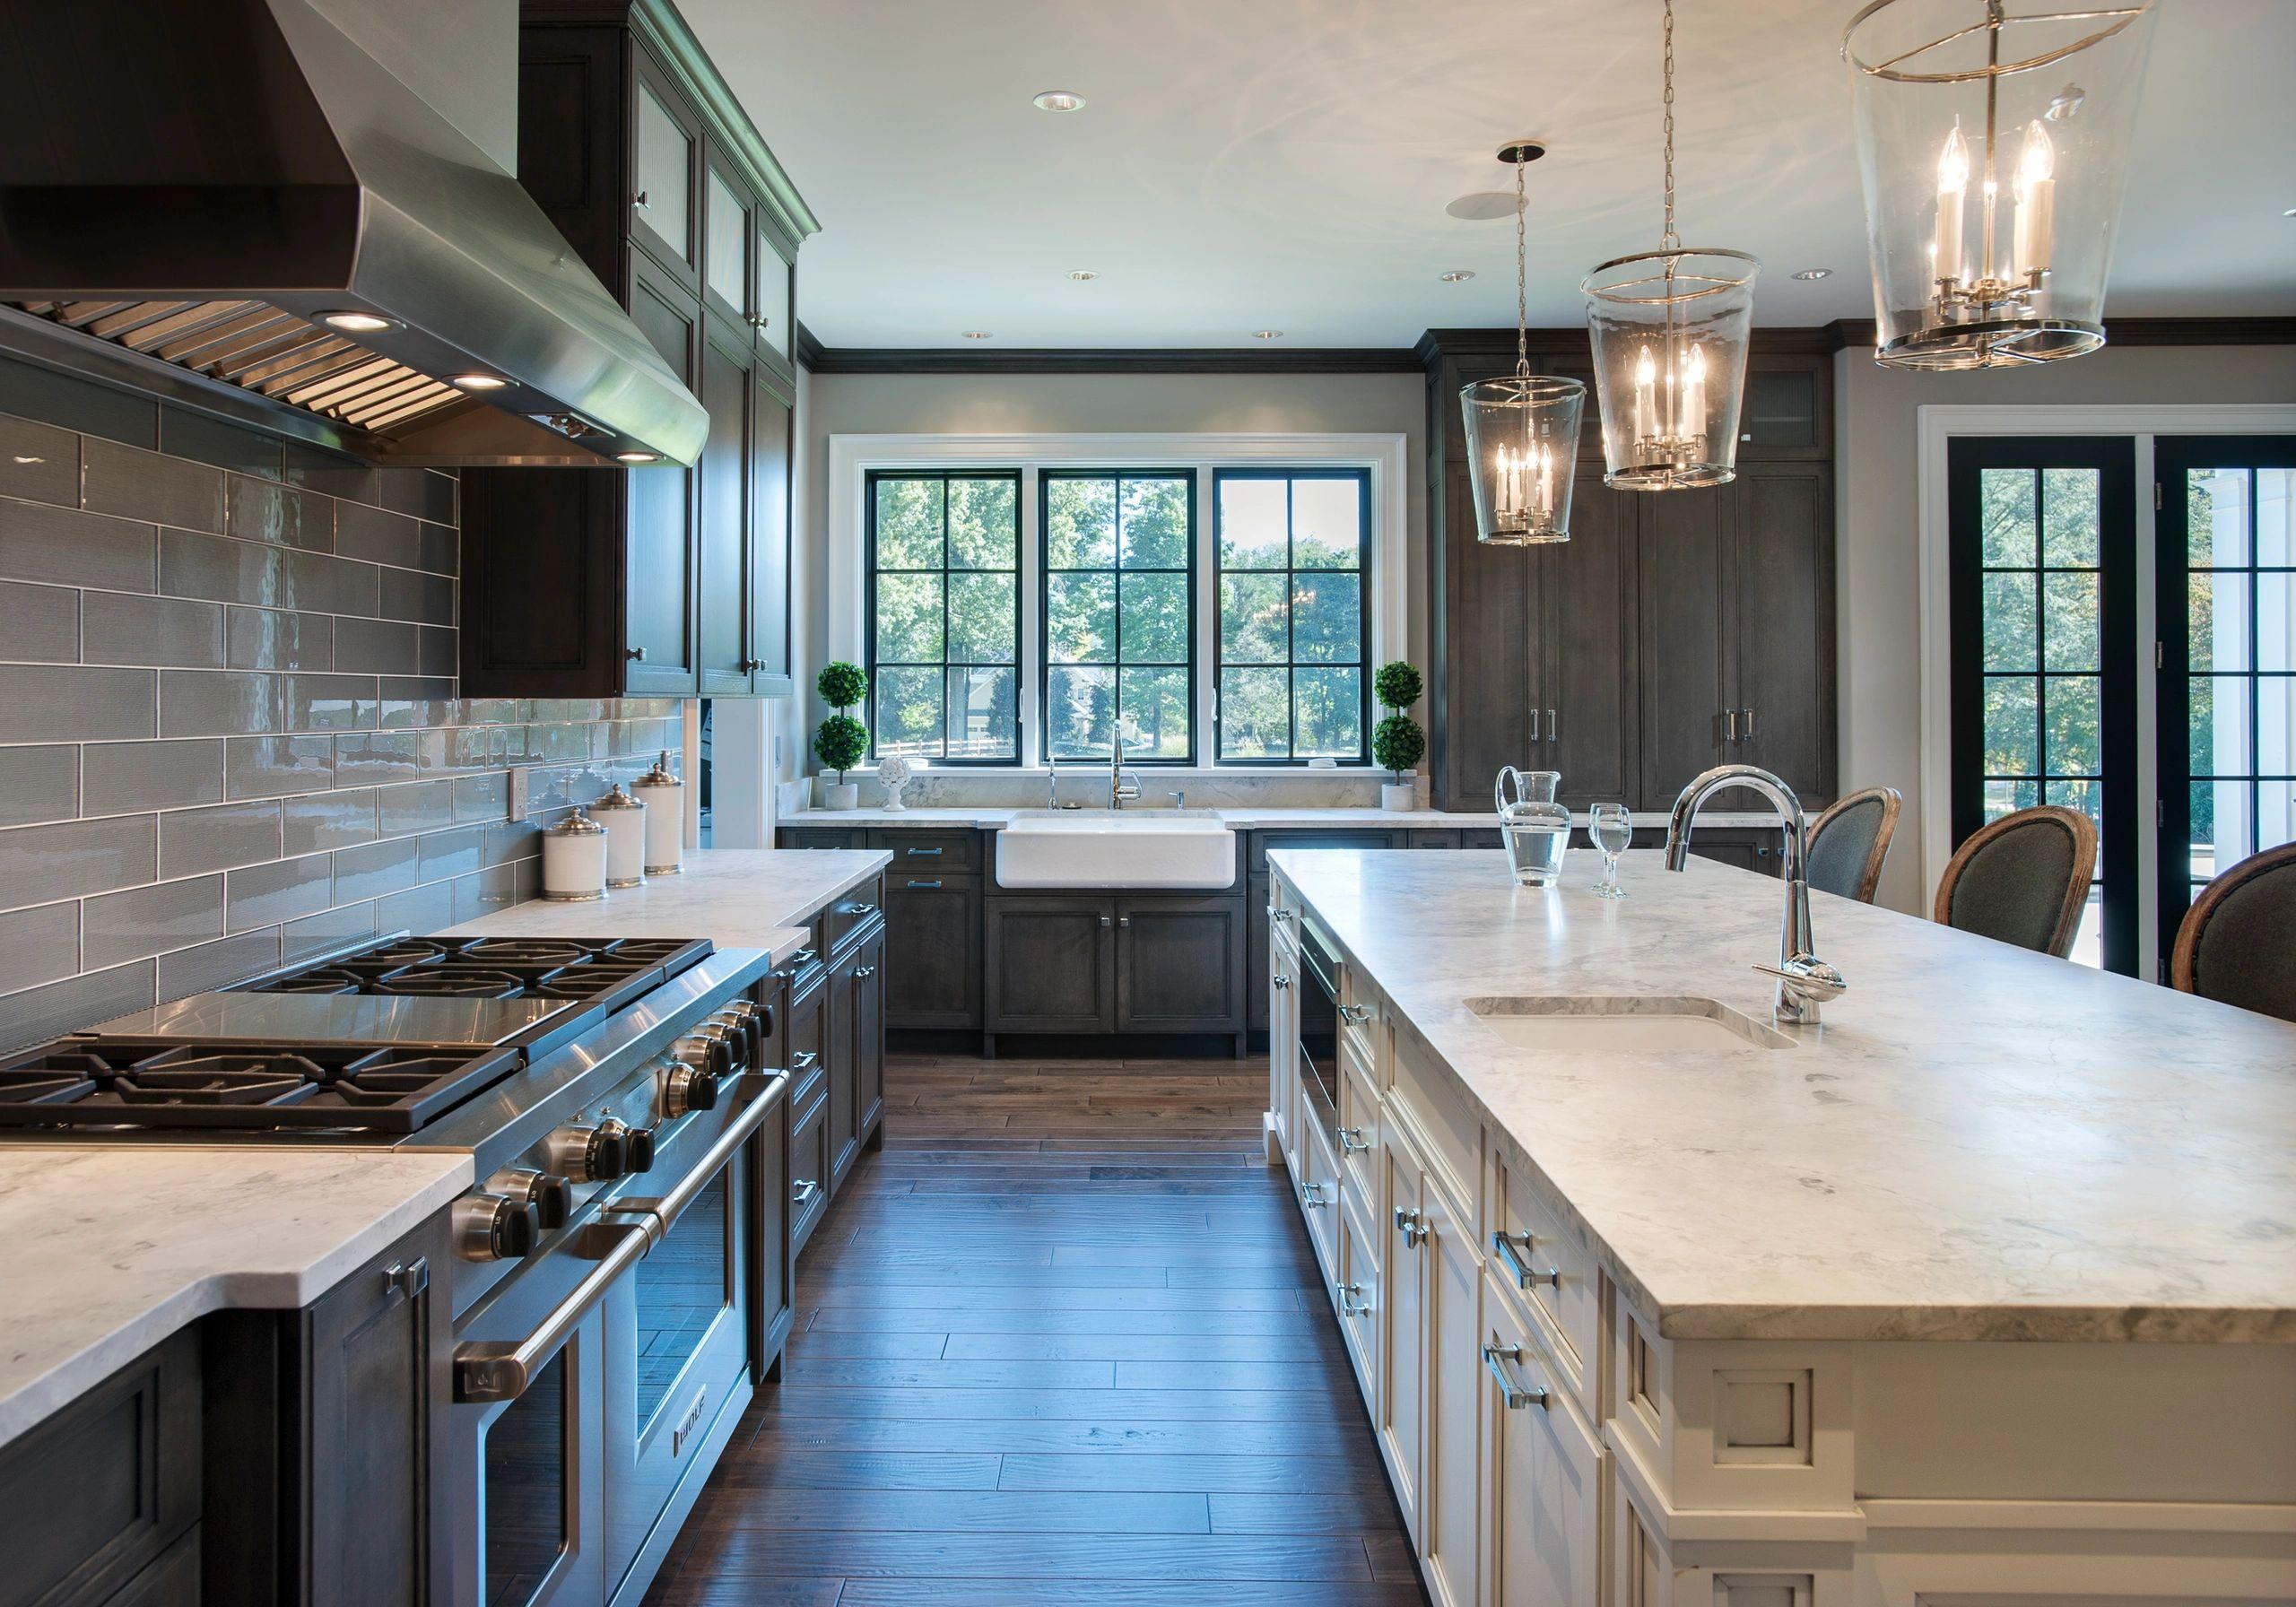 Custom Kitchen, Bath, Design - Starlight Kitchens & Fine Cabinetry